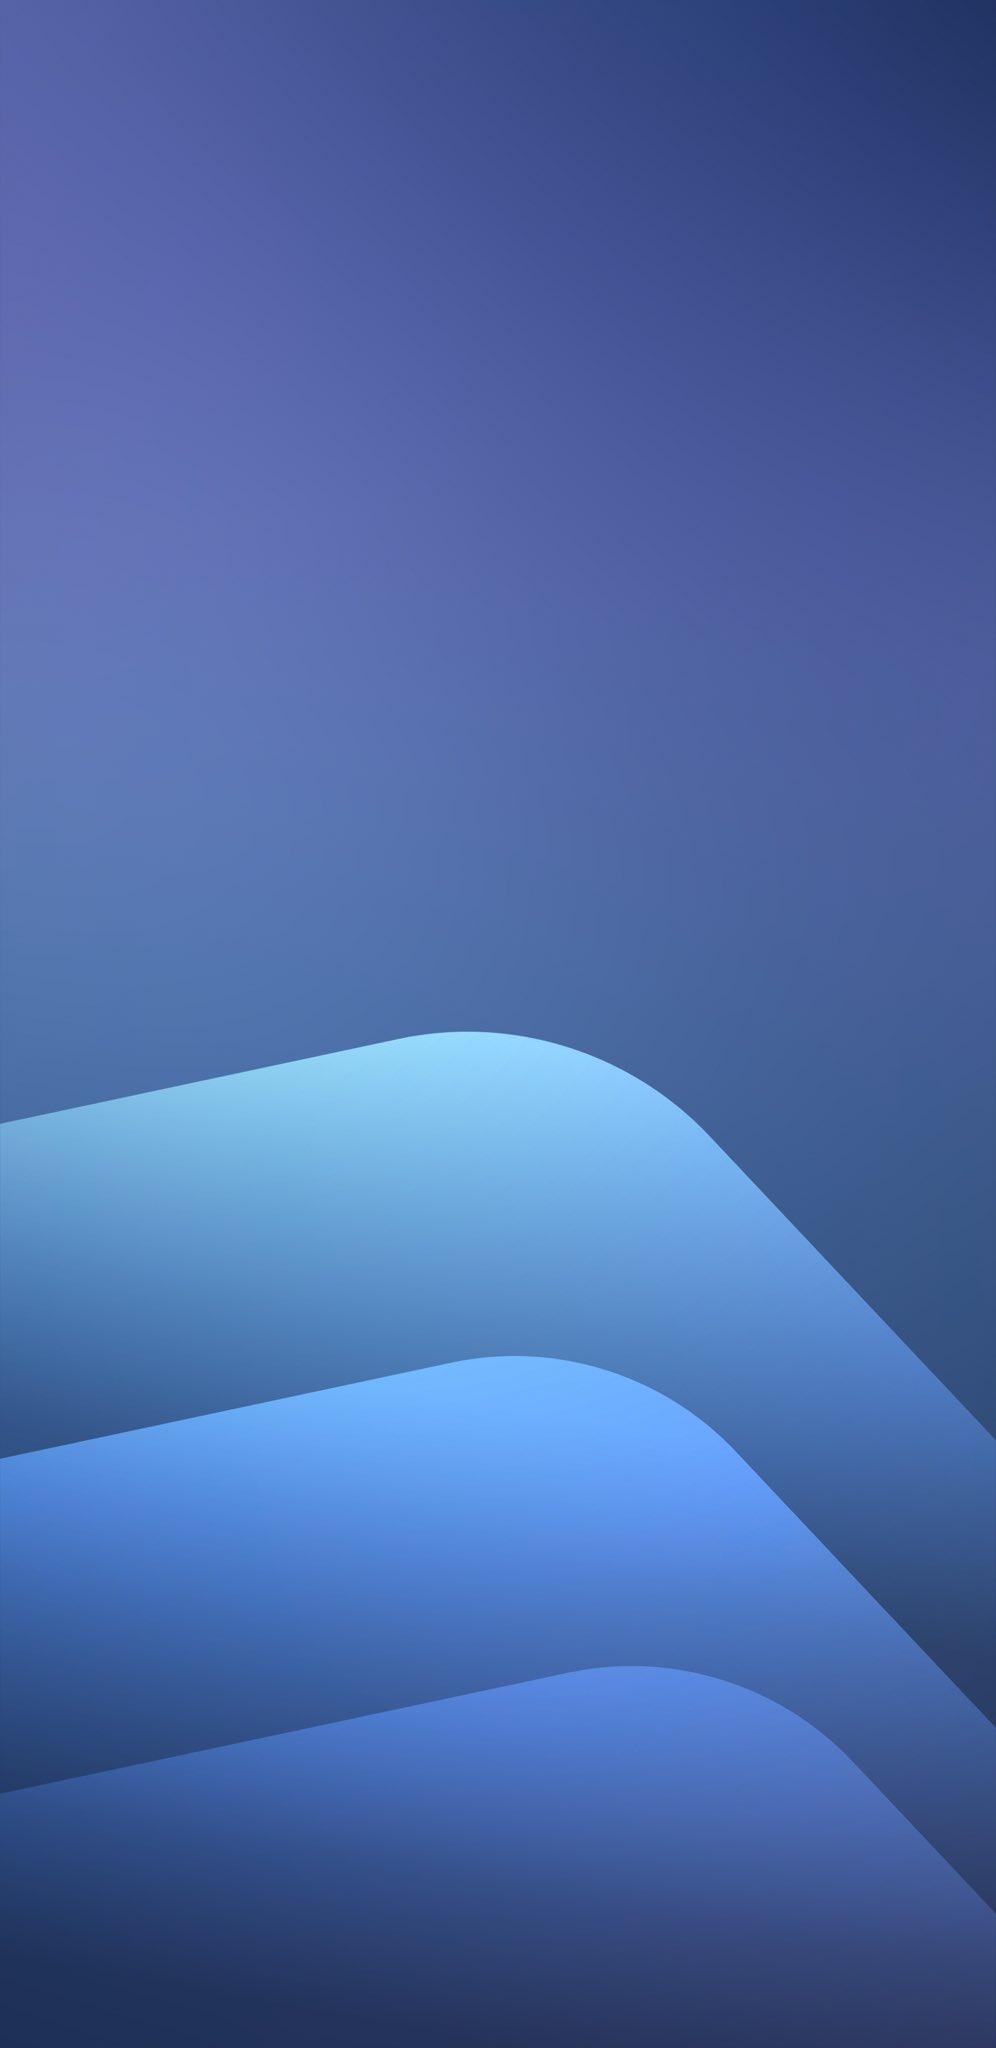 Pacific Blue iphone wallpaper idownloadblog smartechdaily geometric